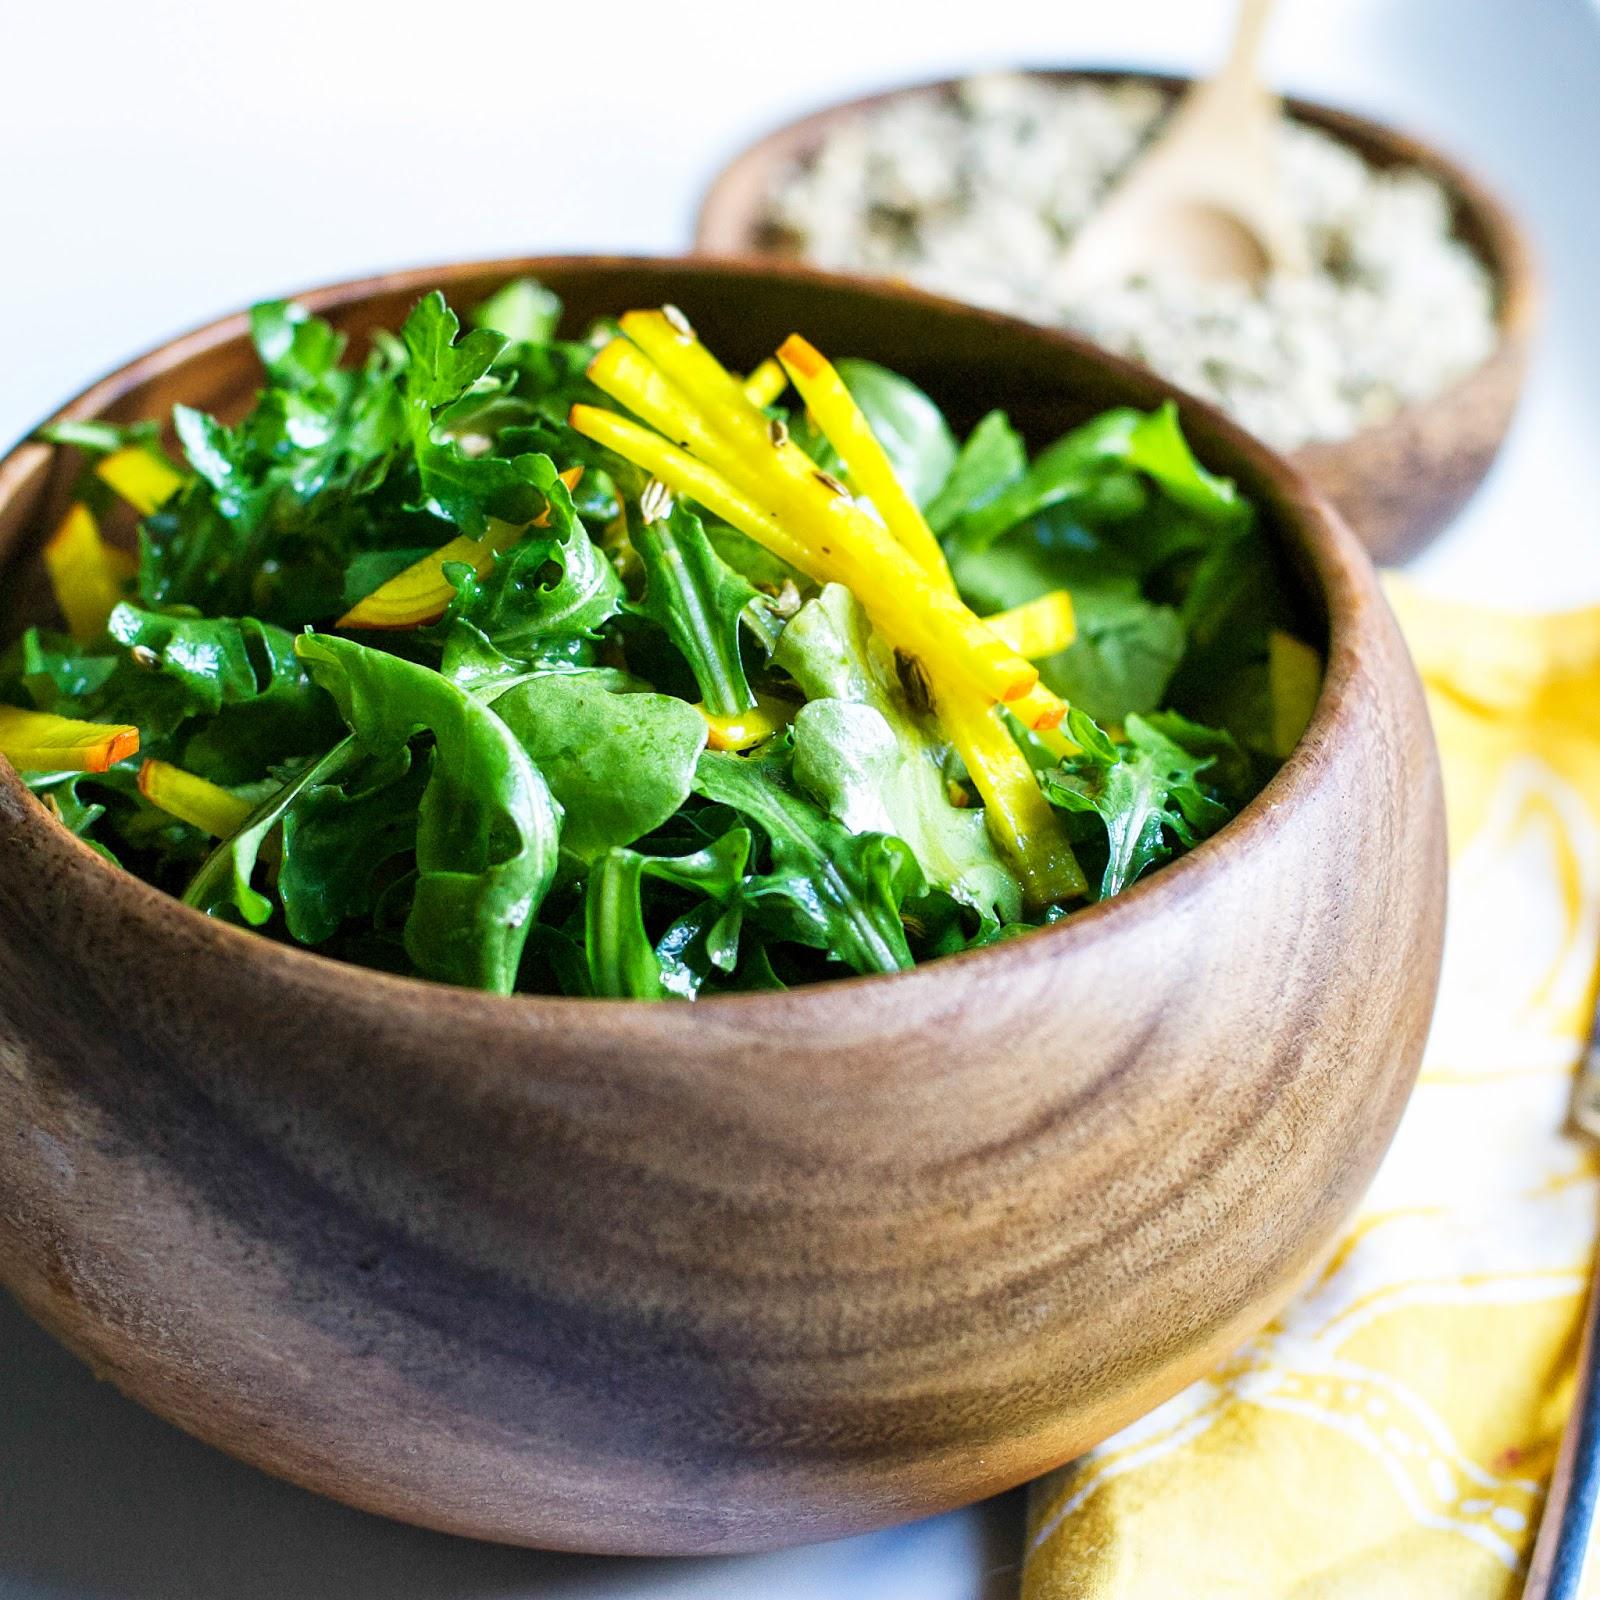 arugula, beets, fennel seeds, detox, healthy, spring, salad, easy, lemon, vinaigrette